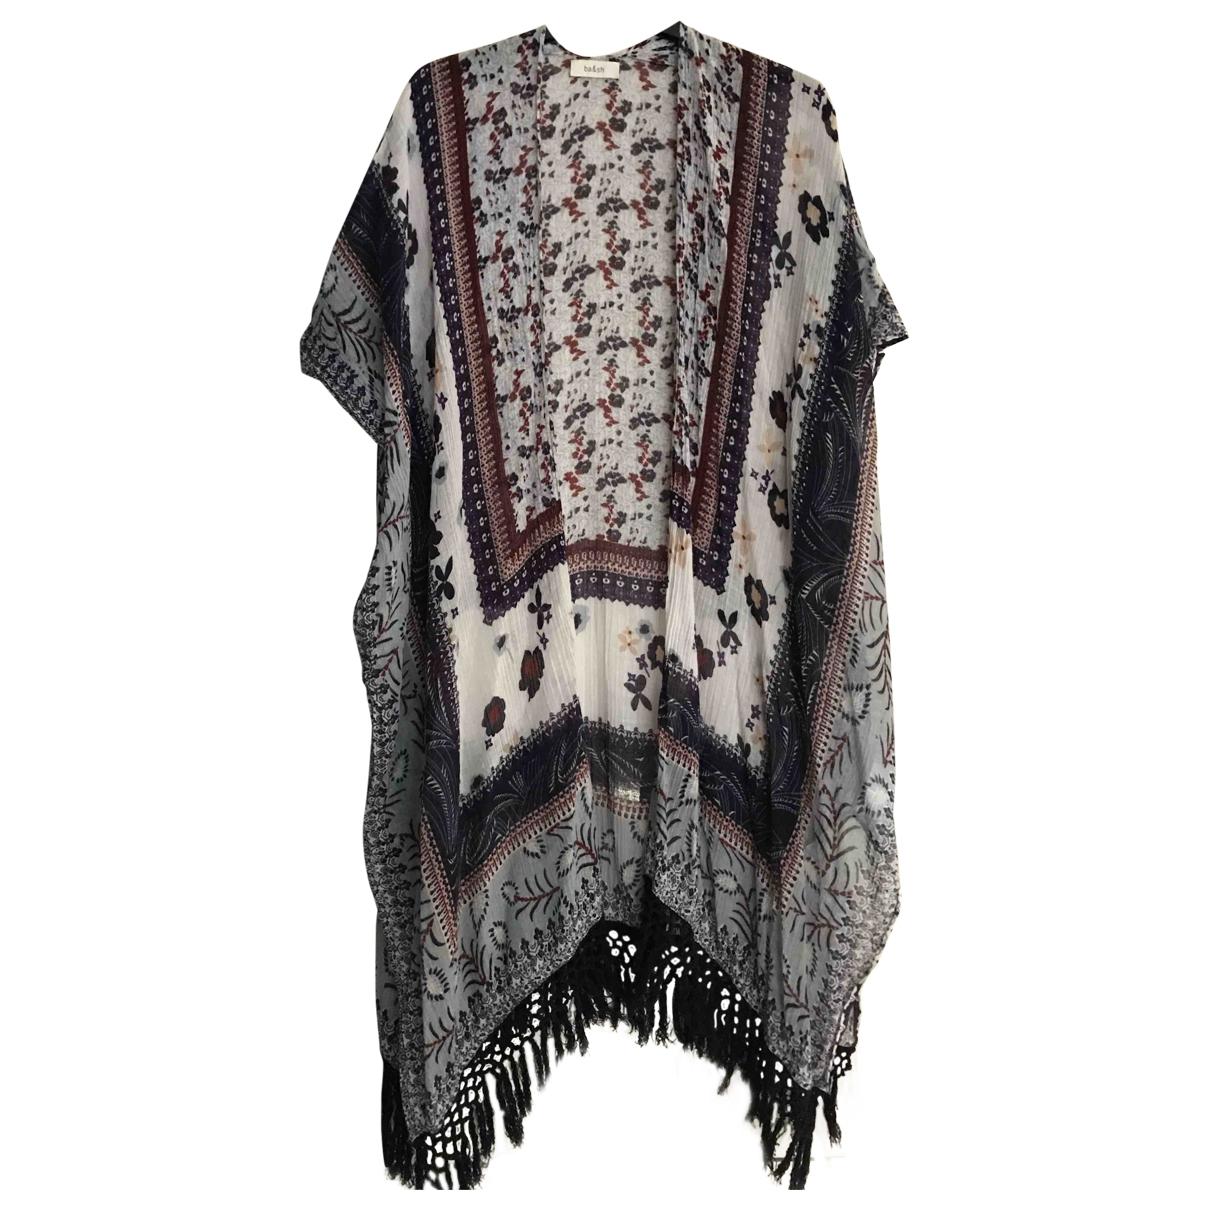 Ba&sh \N Multicolour Cotton jacket for Women One Size 0-5